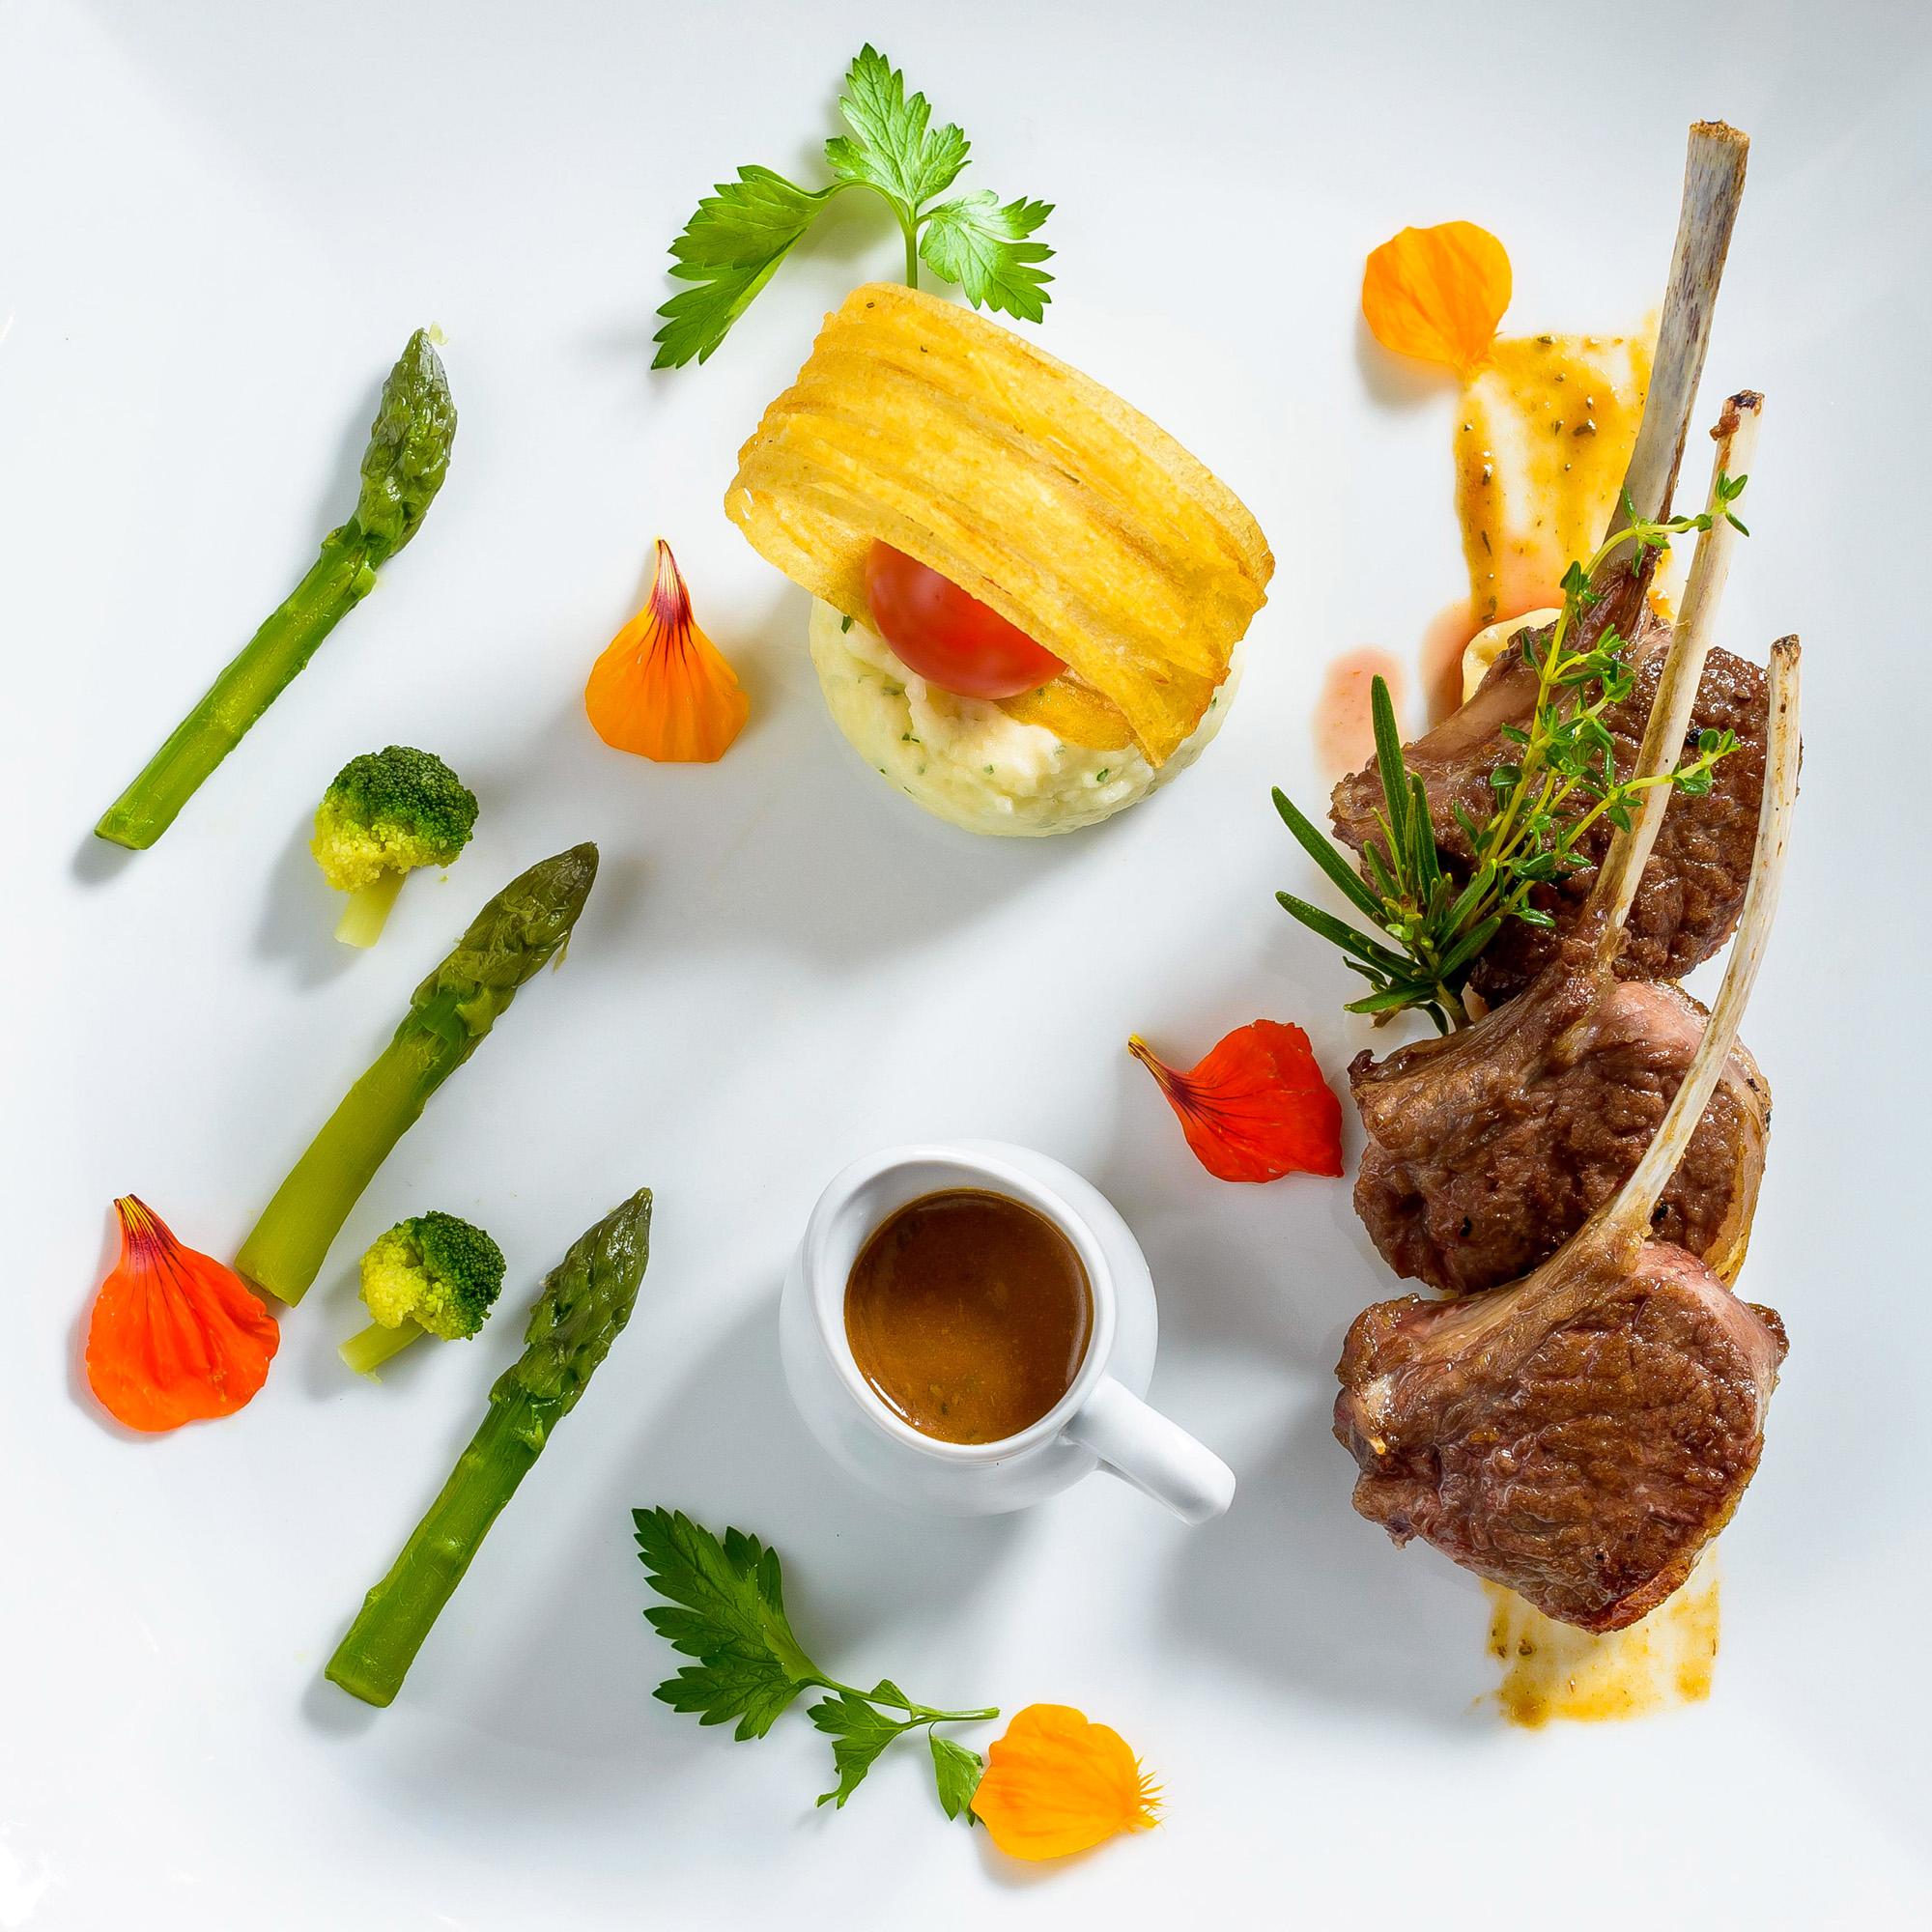 Telfair - Dishes pics-37.jpg